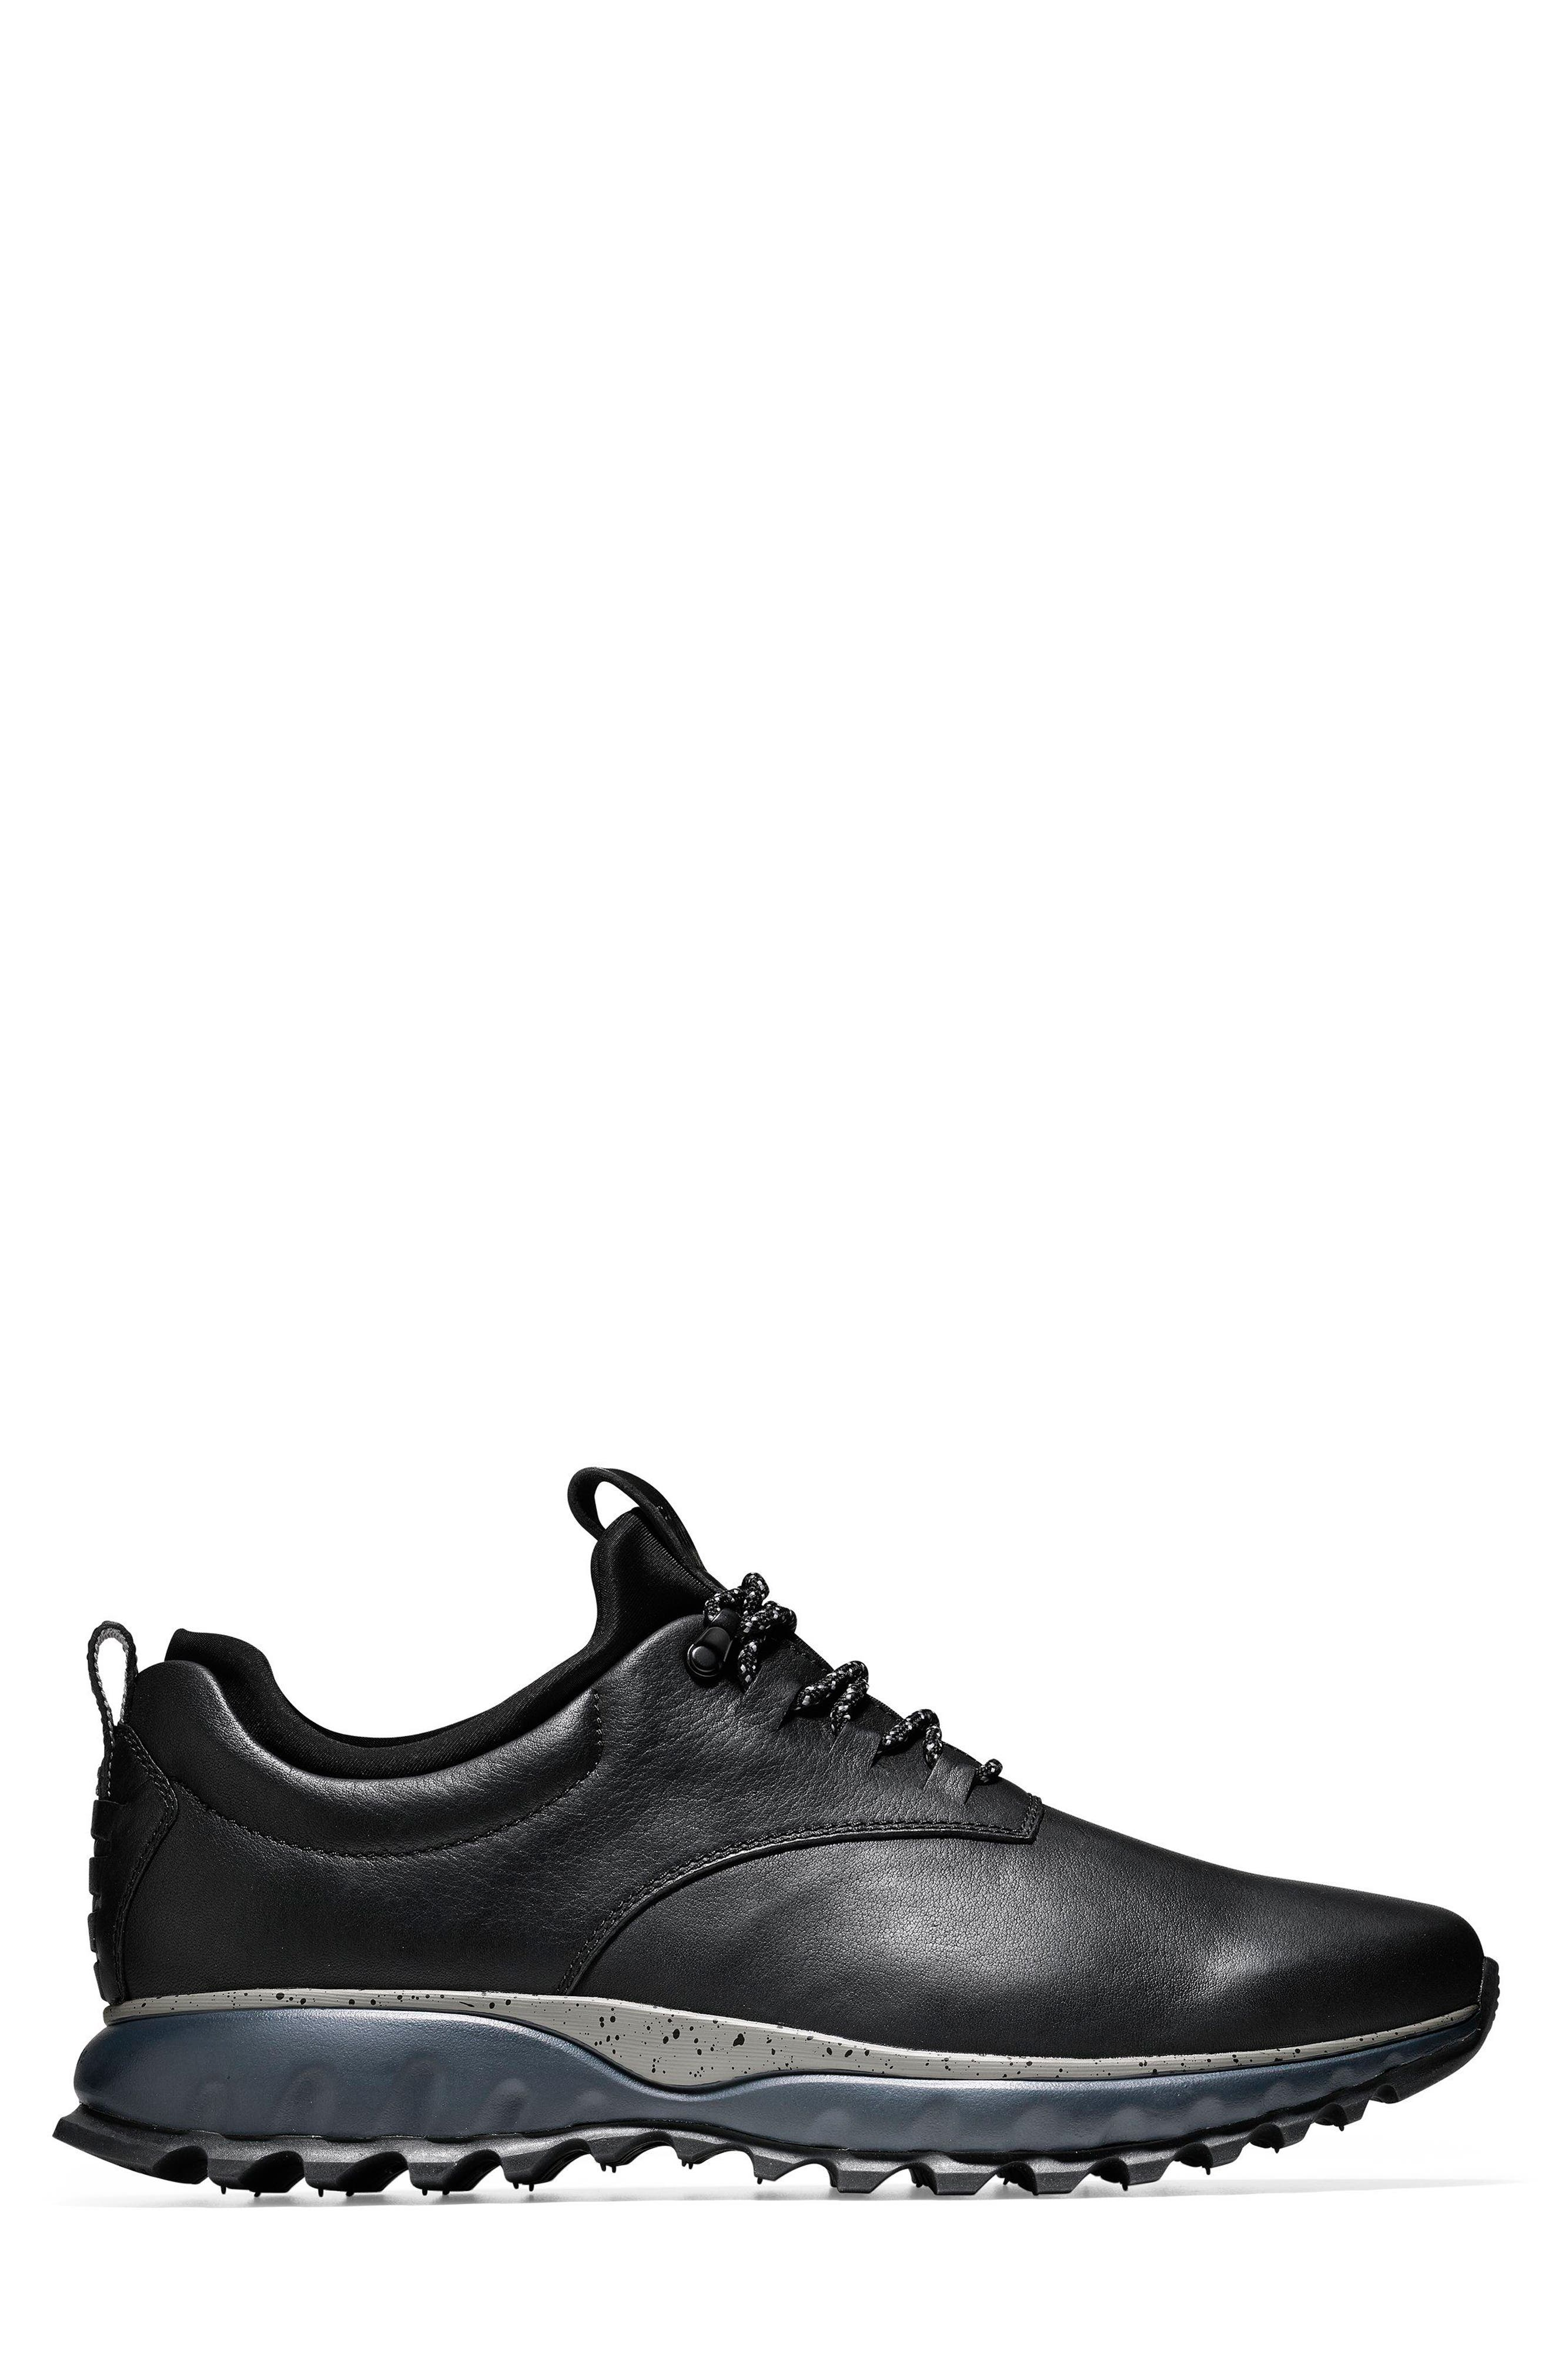 GrandExpløre All Terrain Waterproof Sneaker,                             Alternate thumbnail 3, color,                             Black/ Ironstone Leather